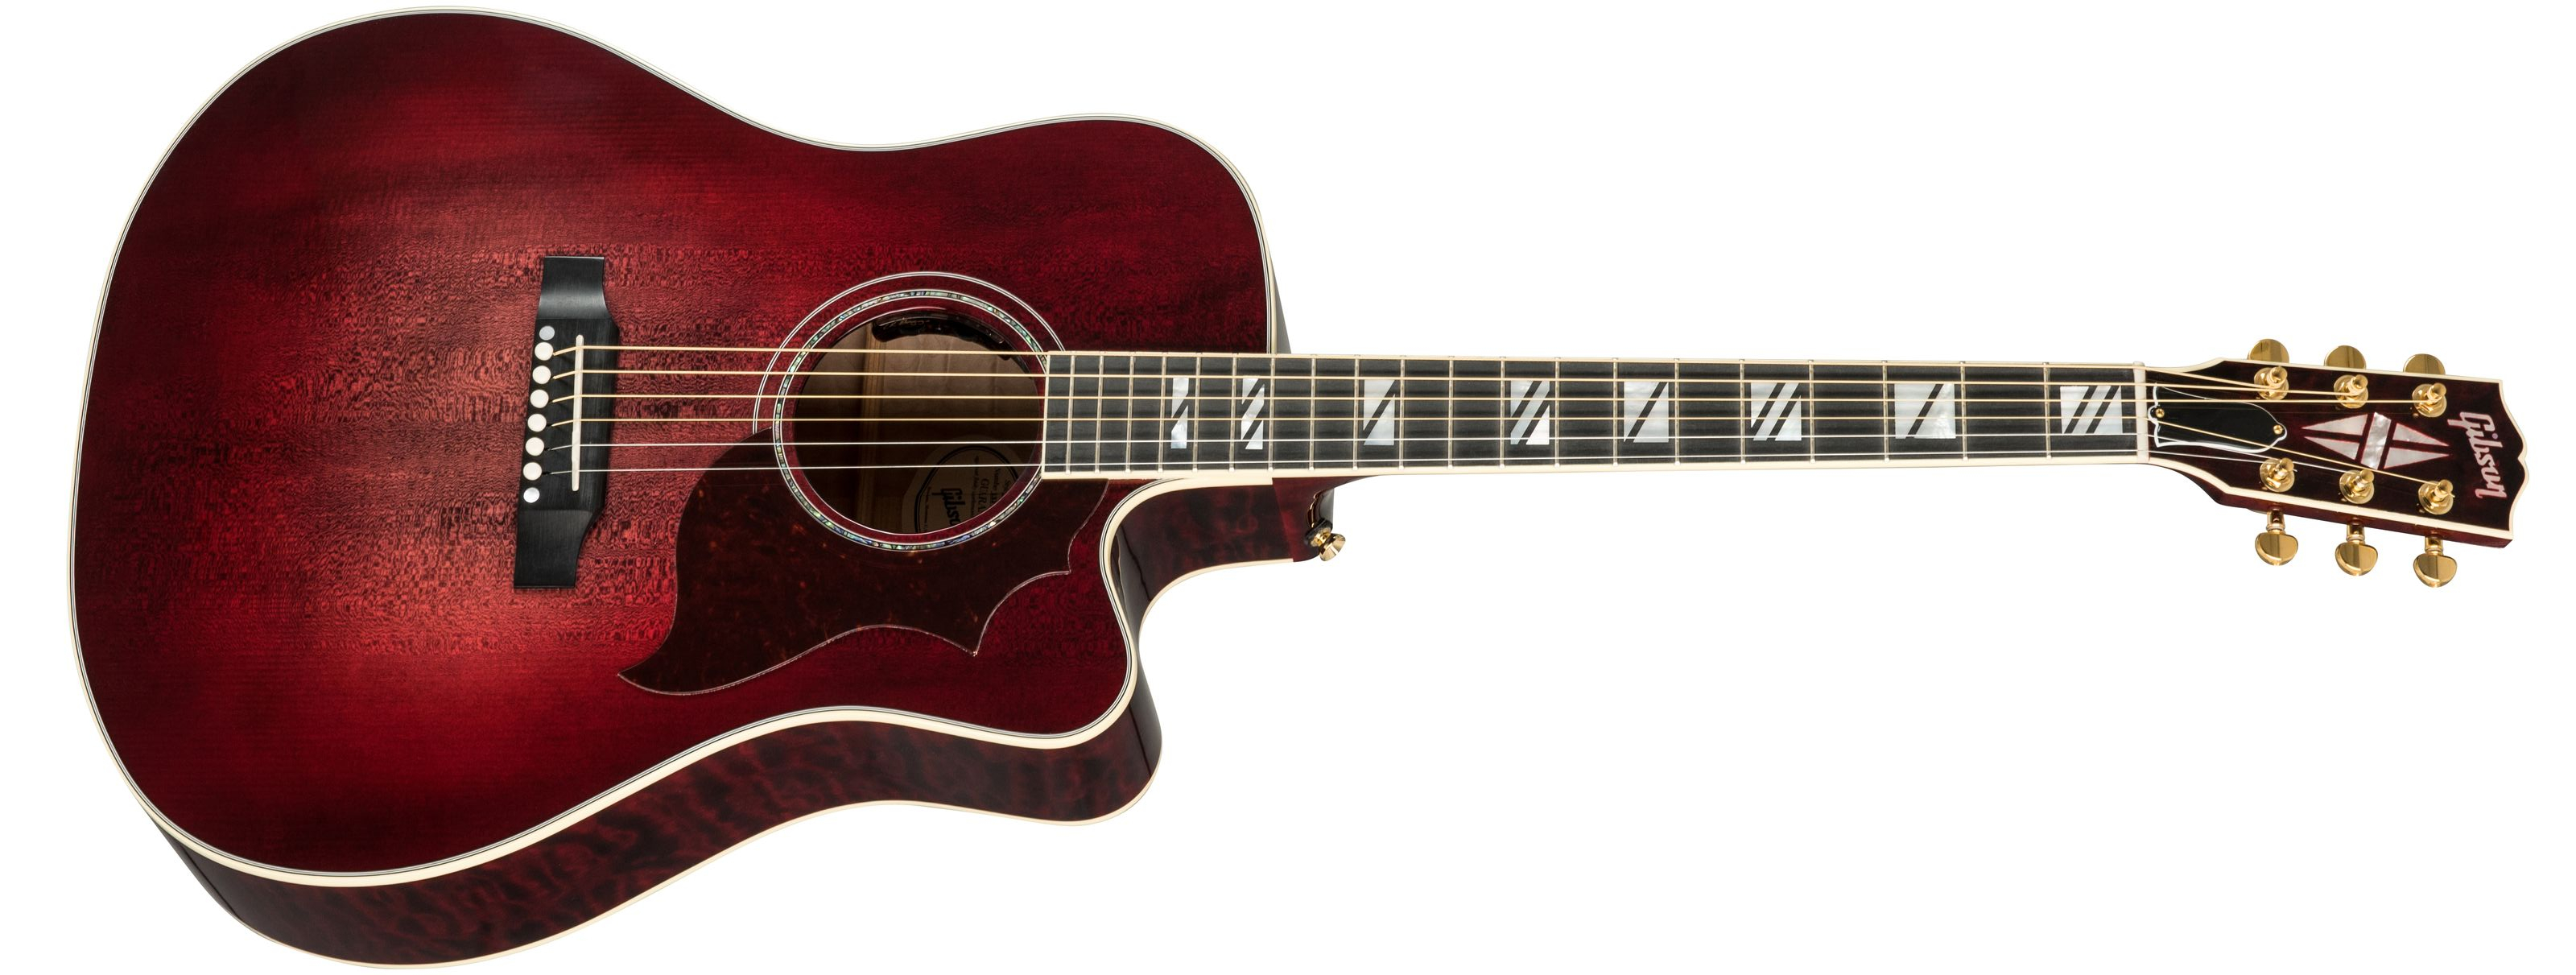 Gibson Hummingbird Chroma 2019 Black Cherry